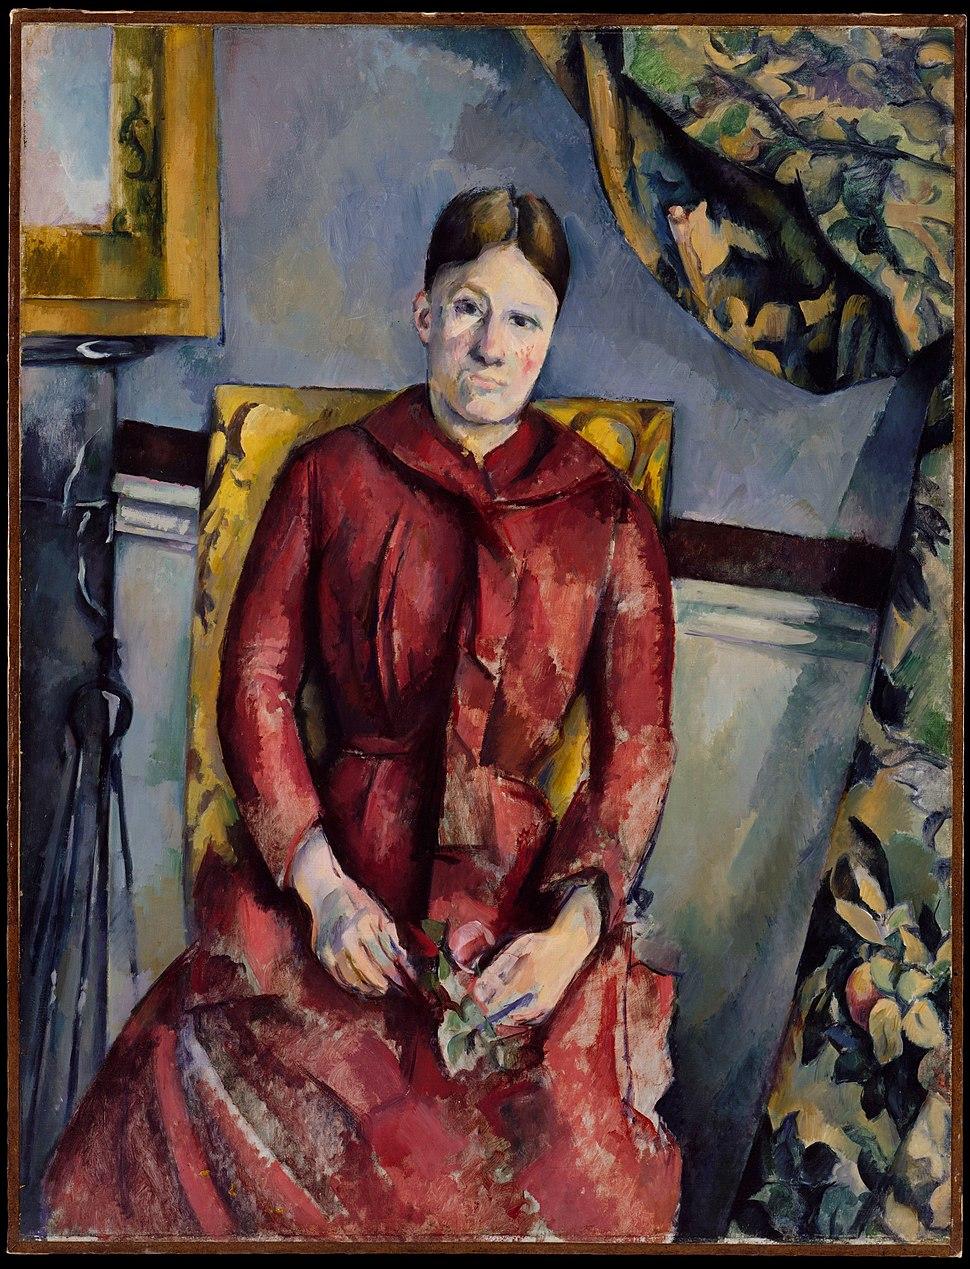 Paul C%C3%A9zanne, 1888-90, Madame C%C3%A9zanne (Hortense Fiquet, 1850%E2%80%931922) in a Red Dress, oil on canvas, 116.5 x 89.5 cm, The Metropolitan Museum of Art, New York